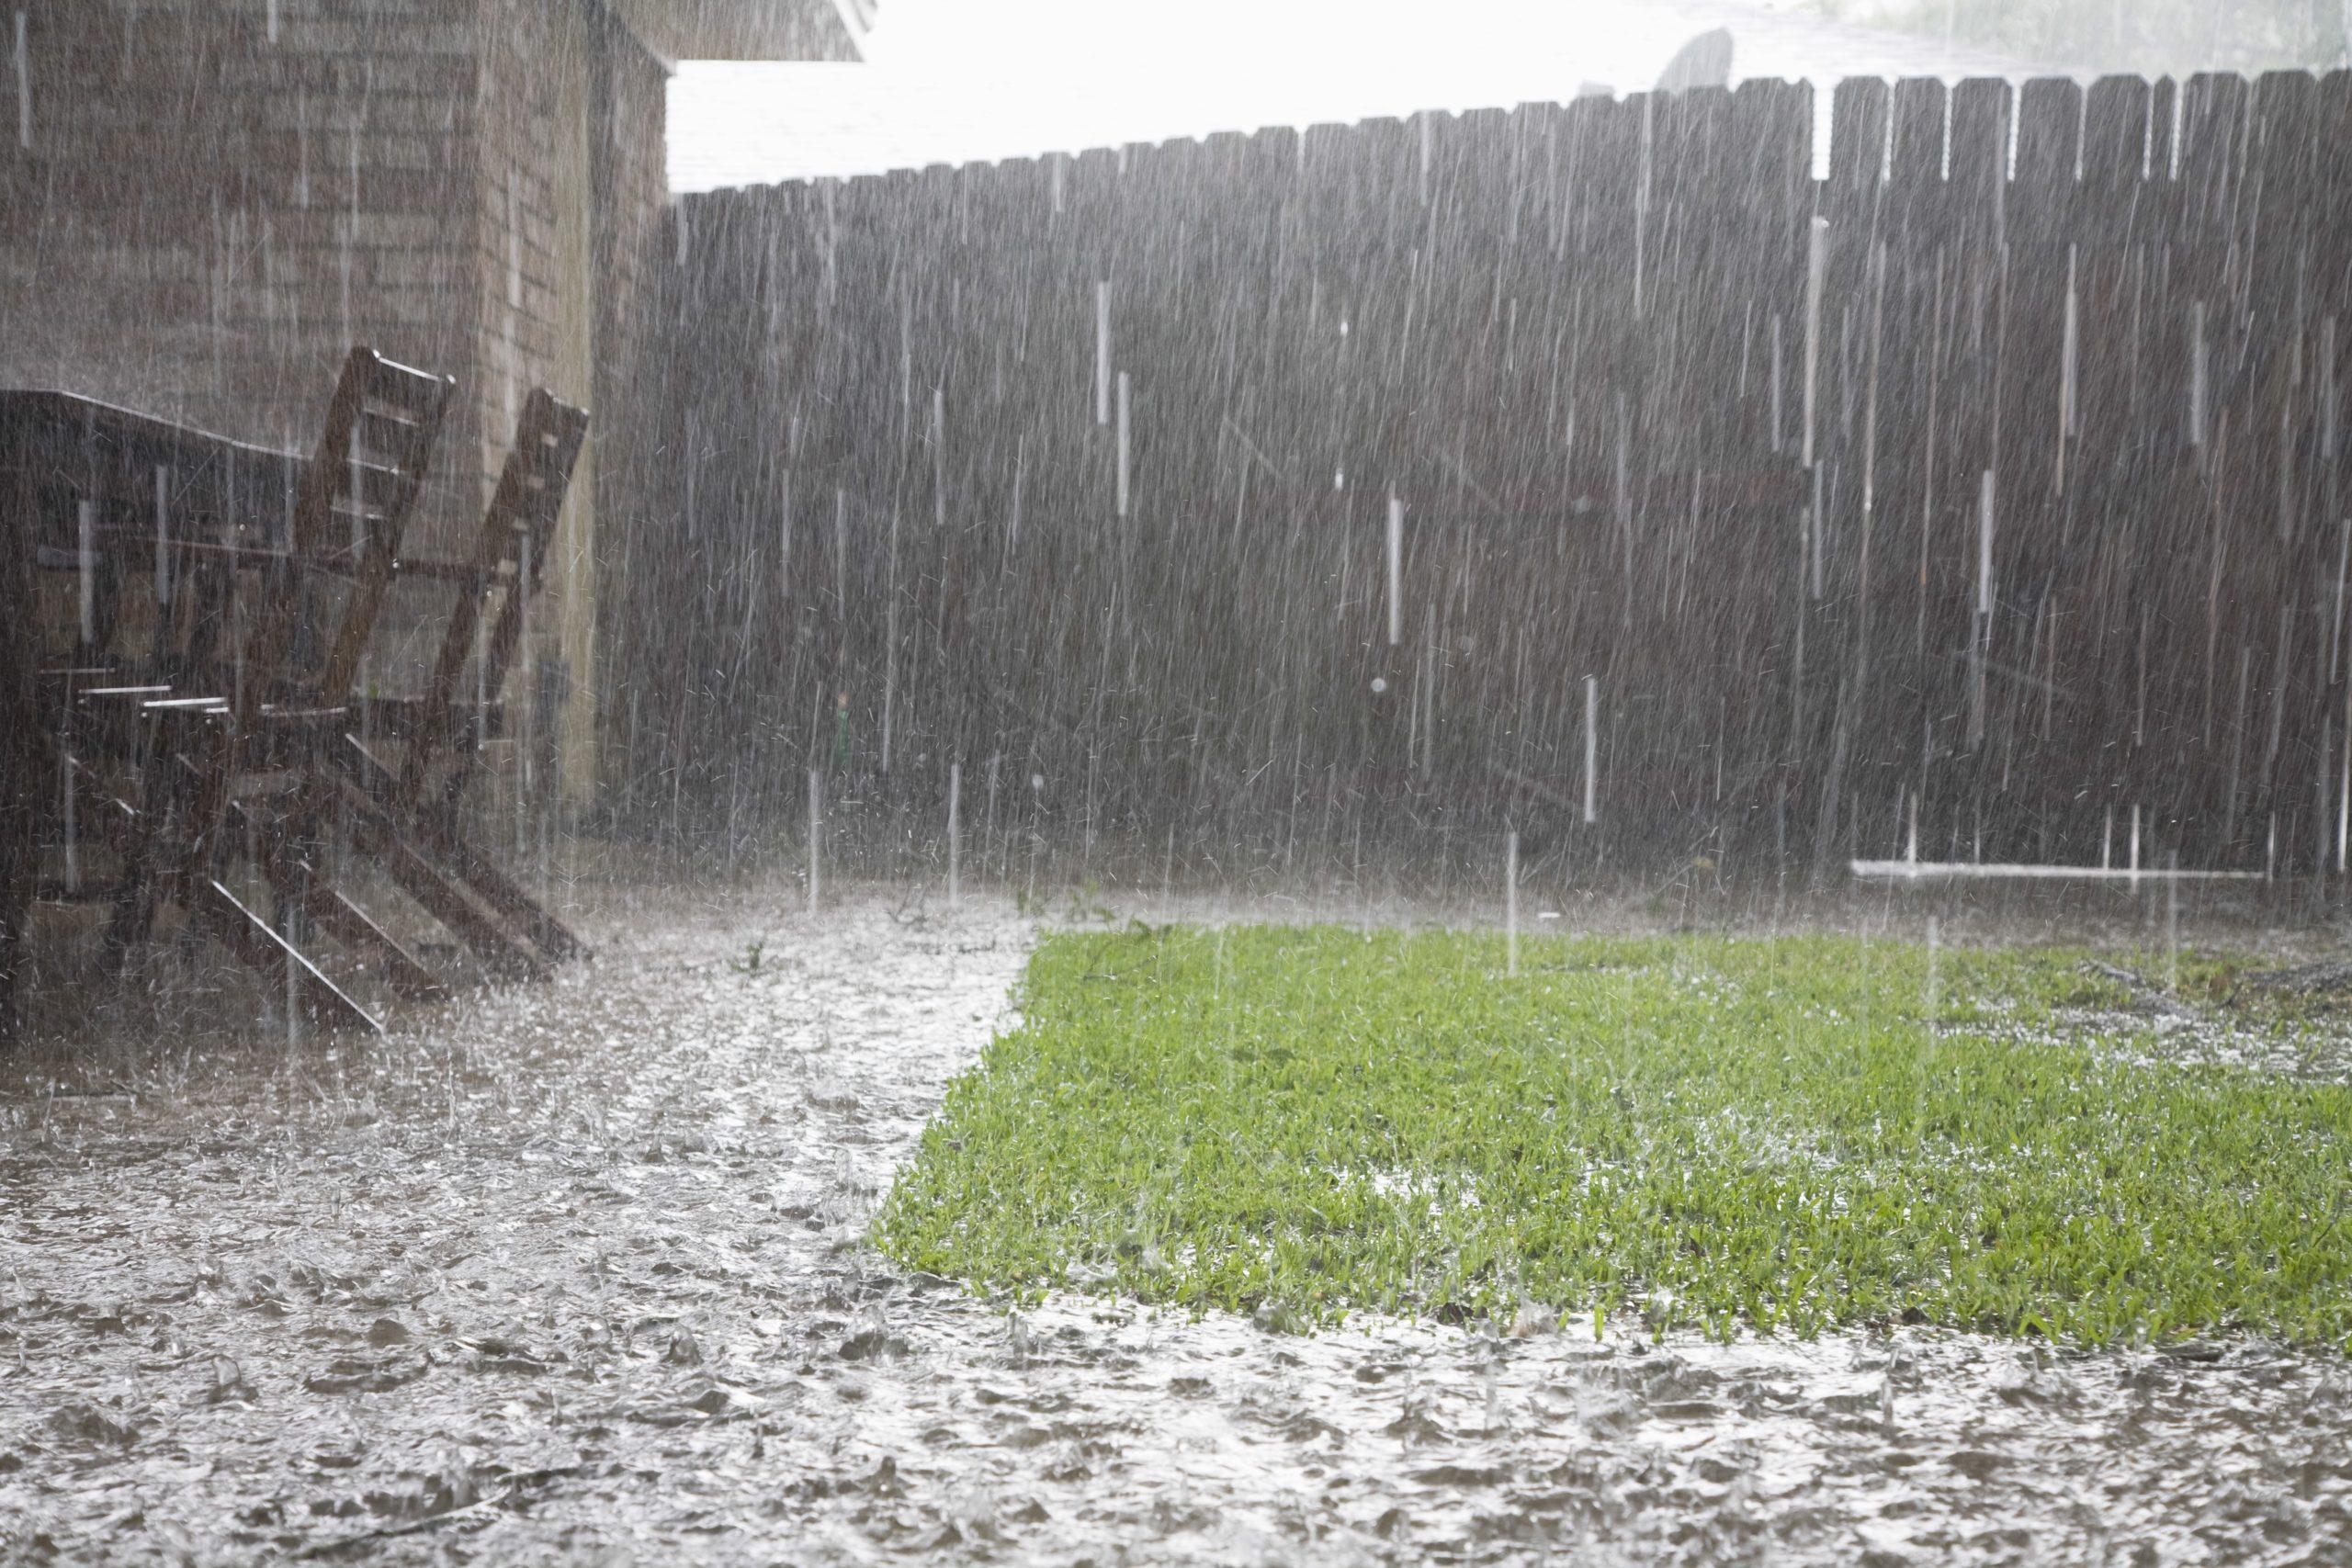 flooding backyard after storm